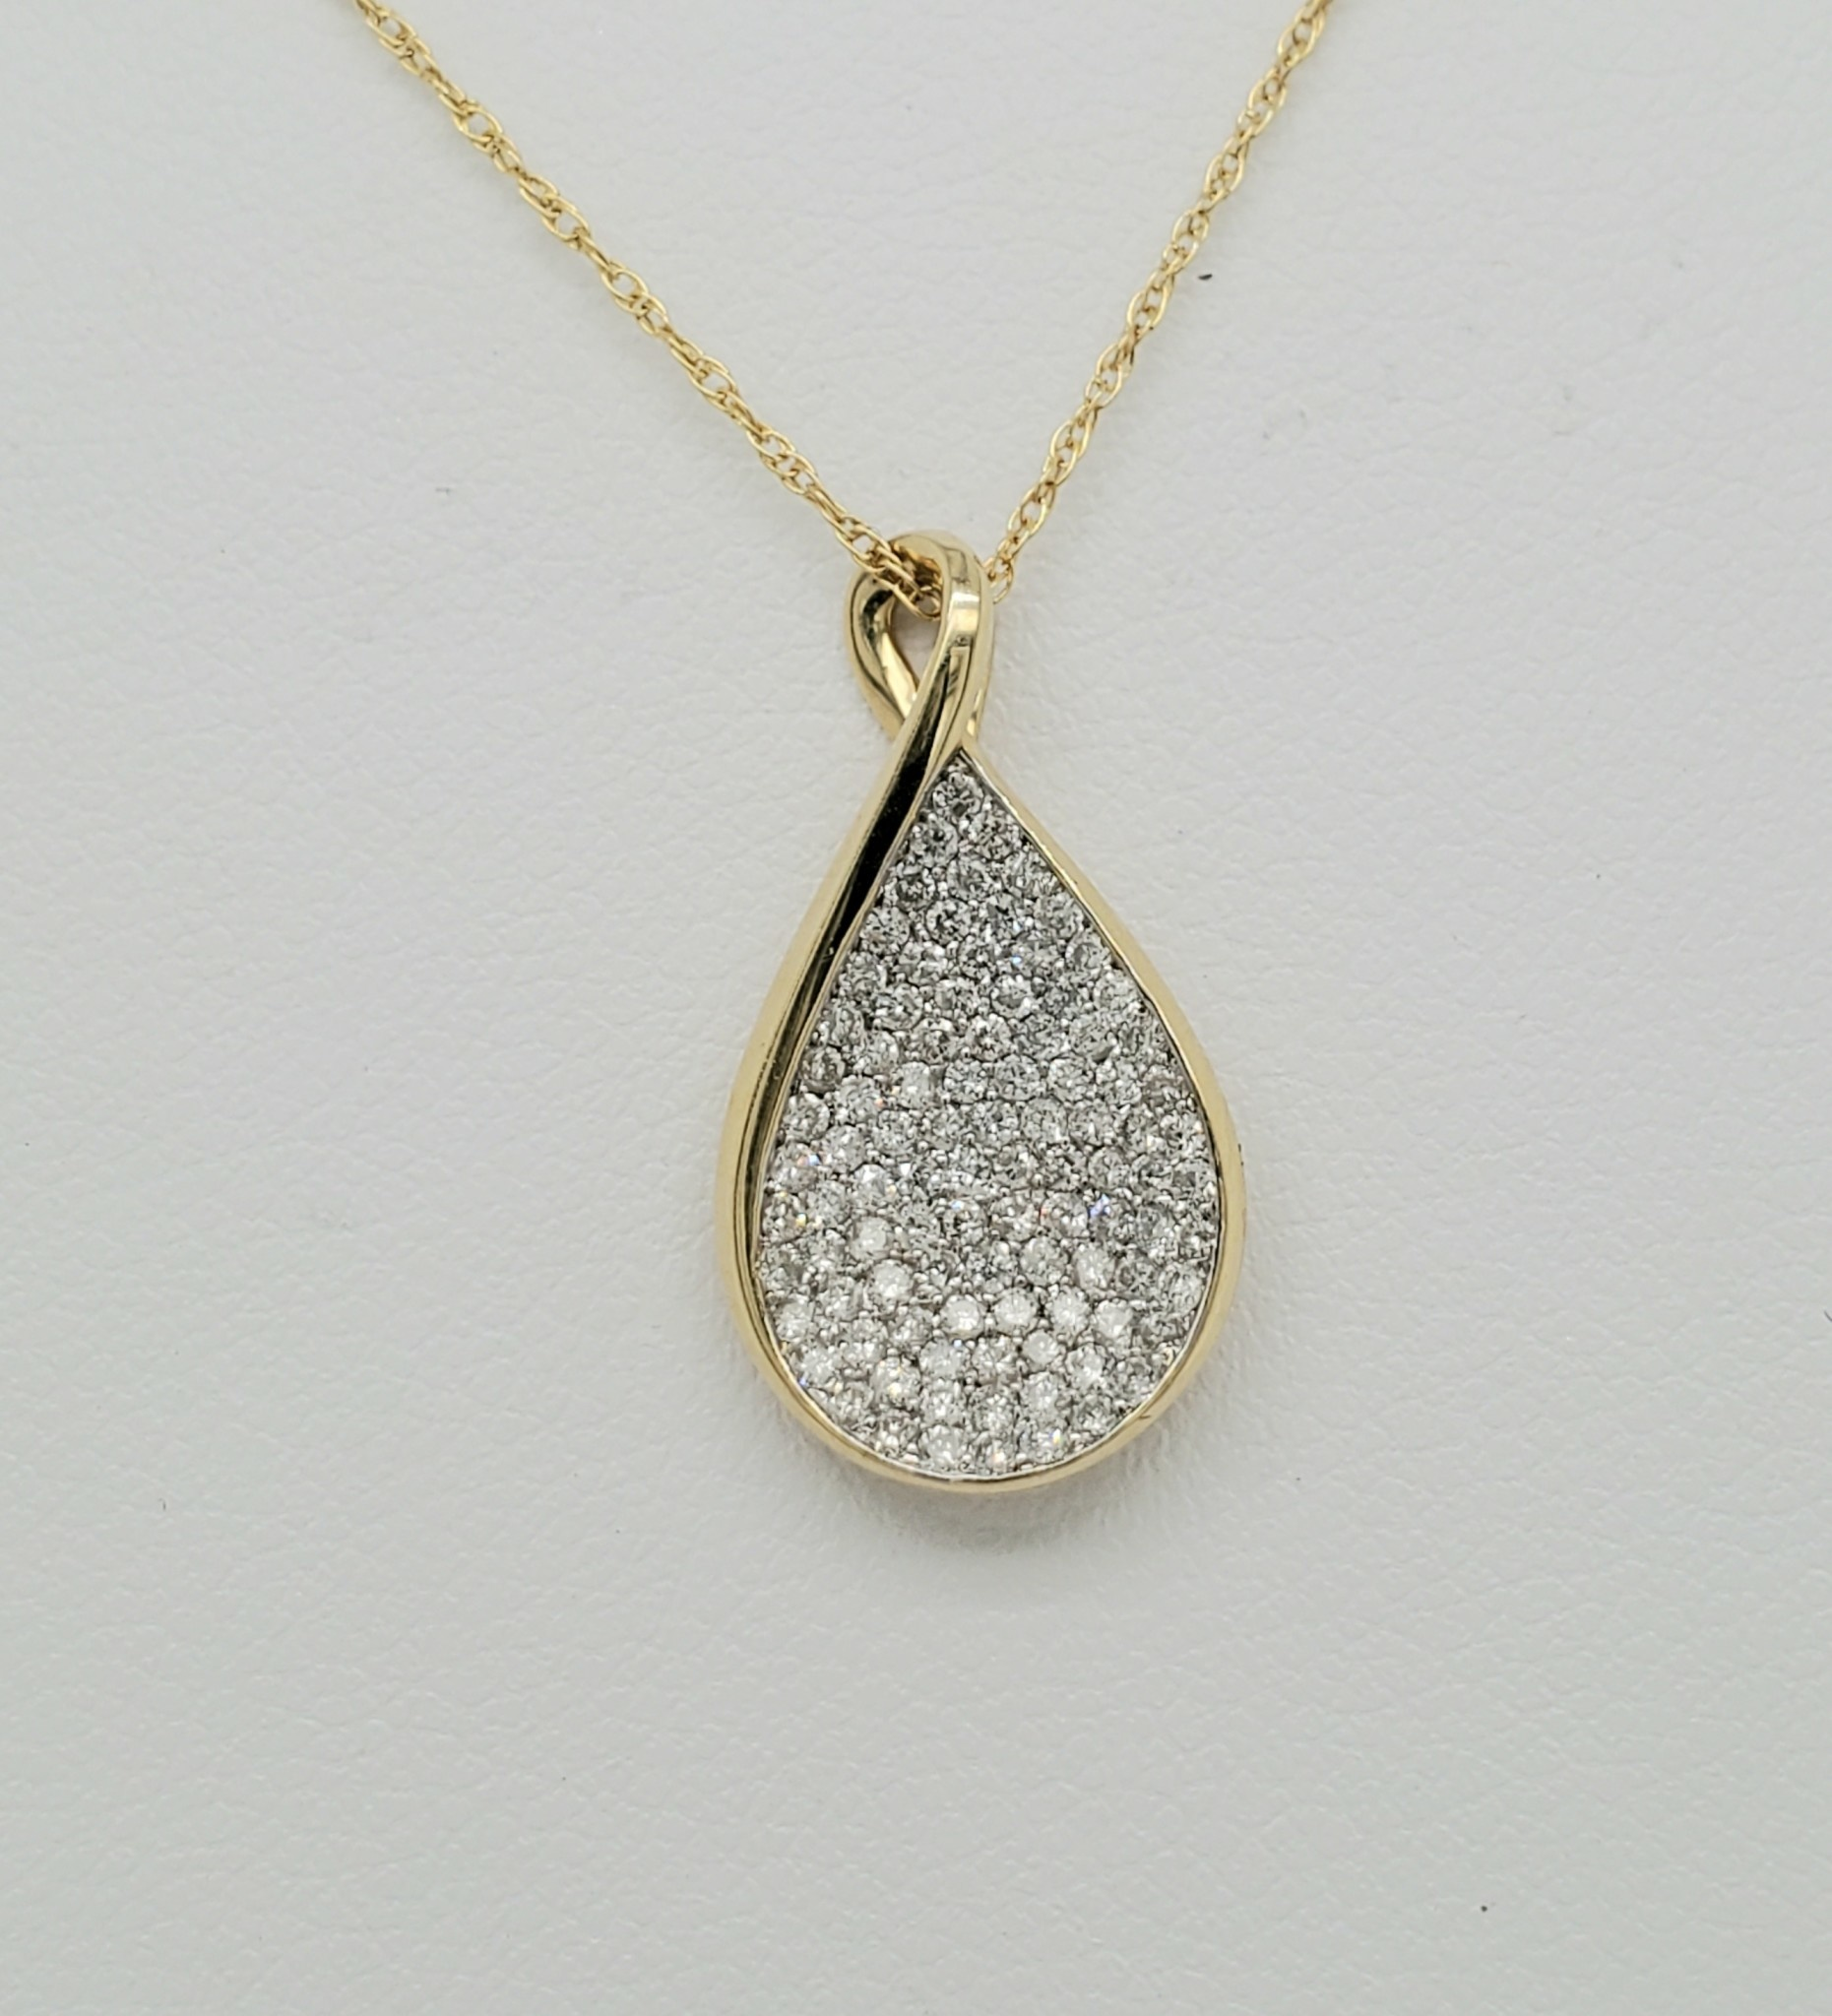 14KT YG Diamond Drop Pendant 0.50 CTTW